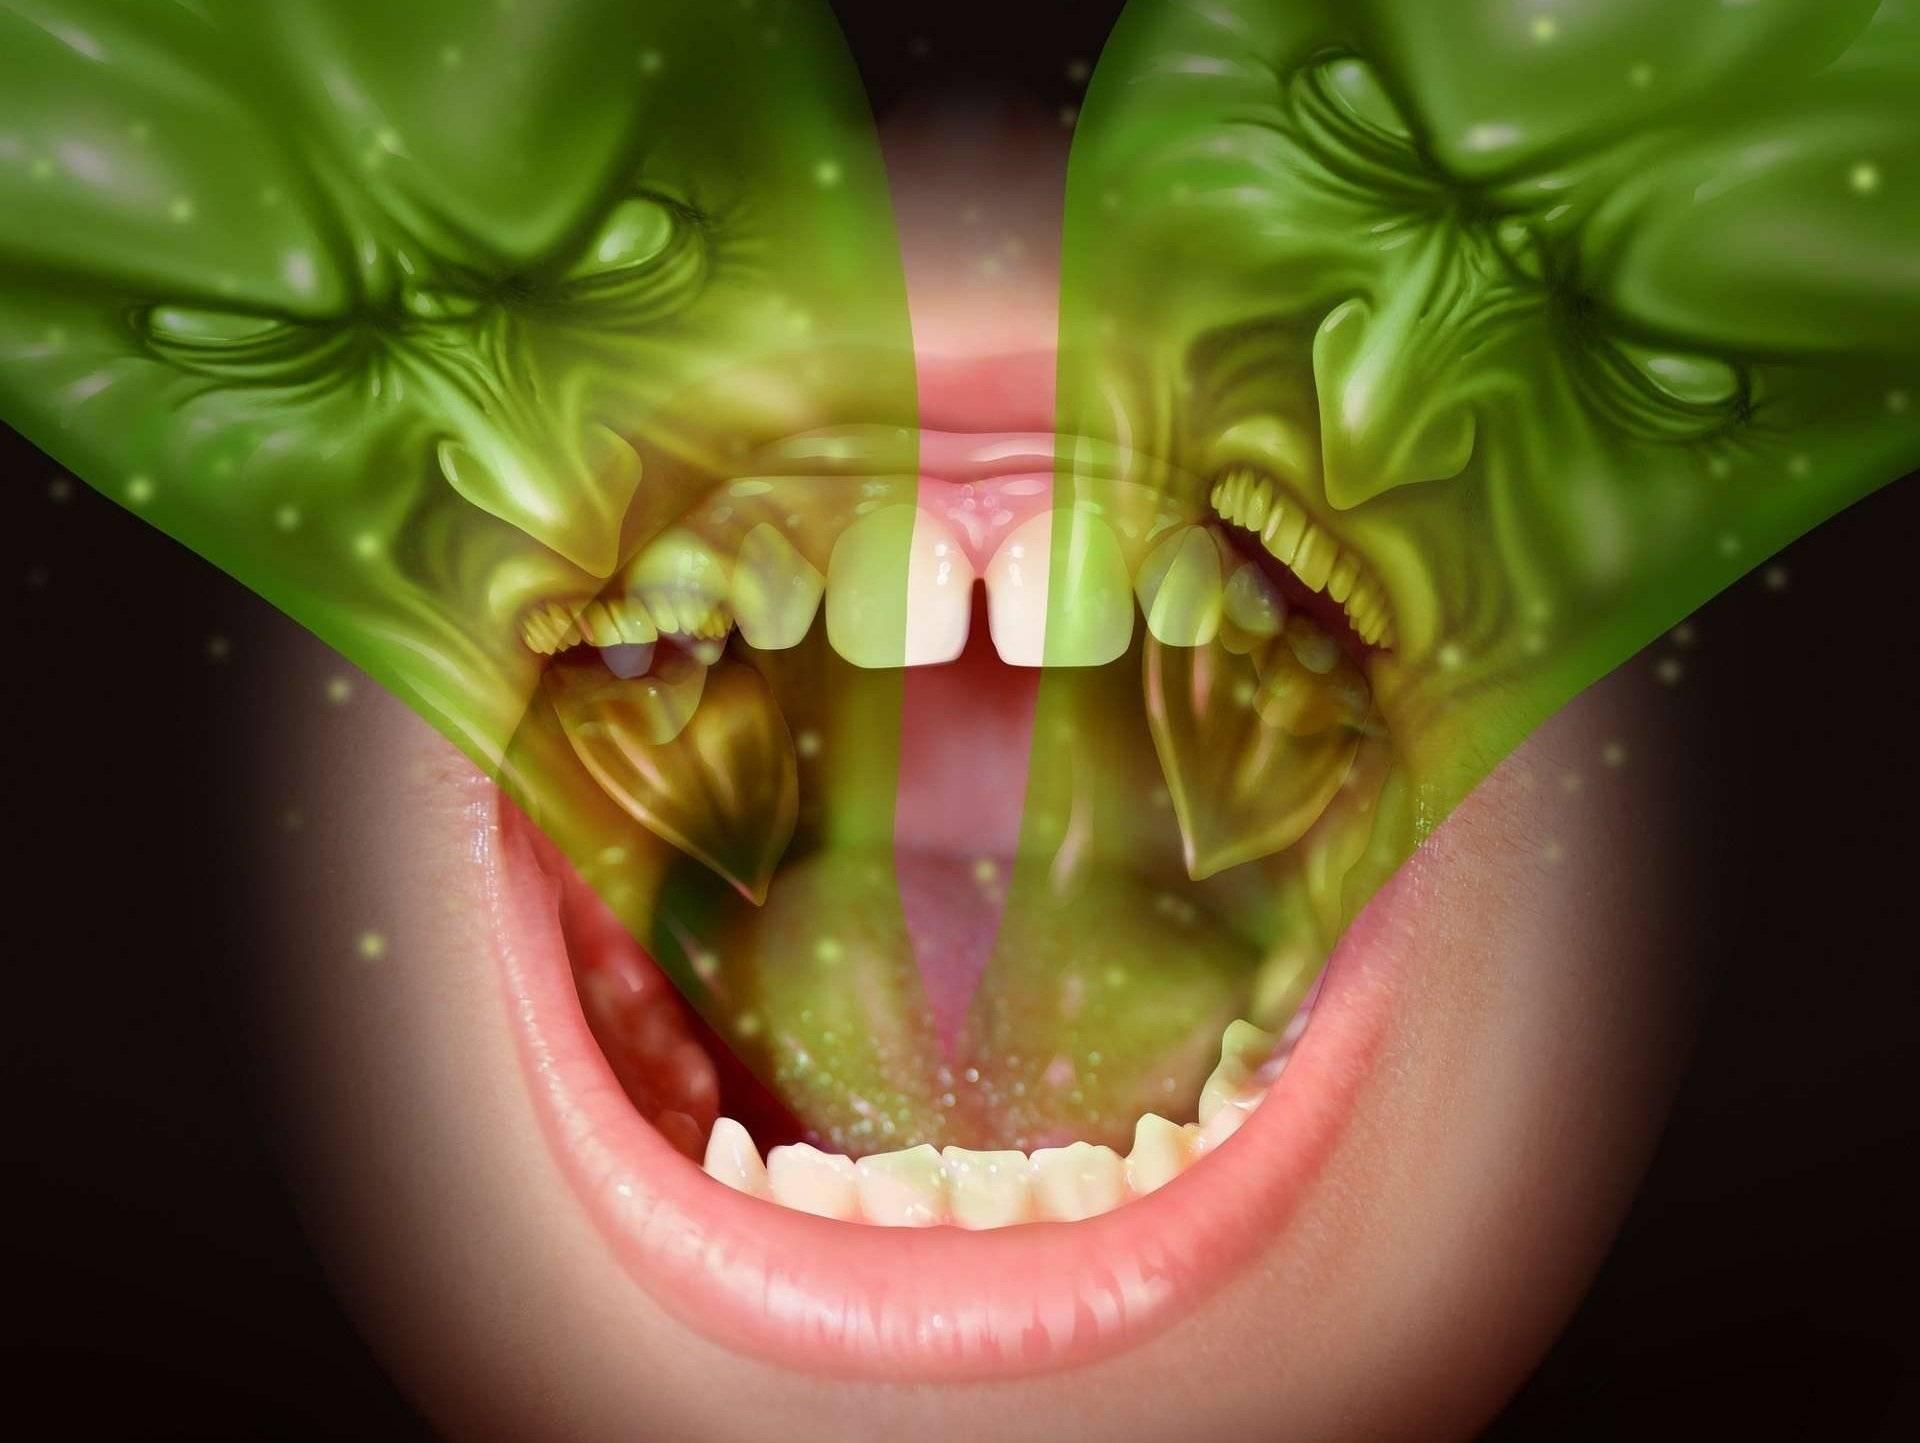 Запах изо рта при тонзиллите: причины появления